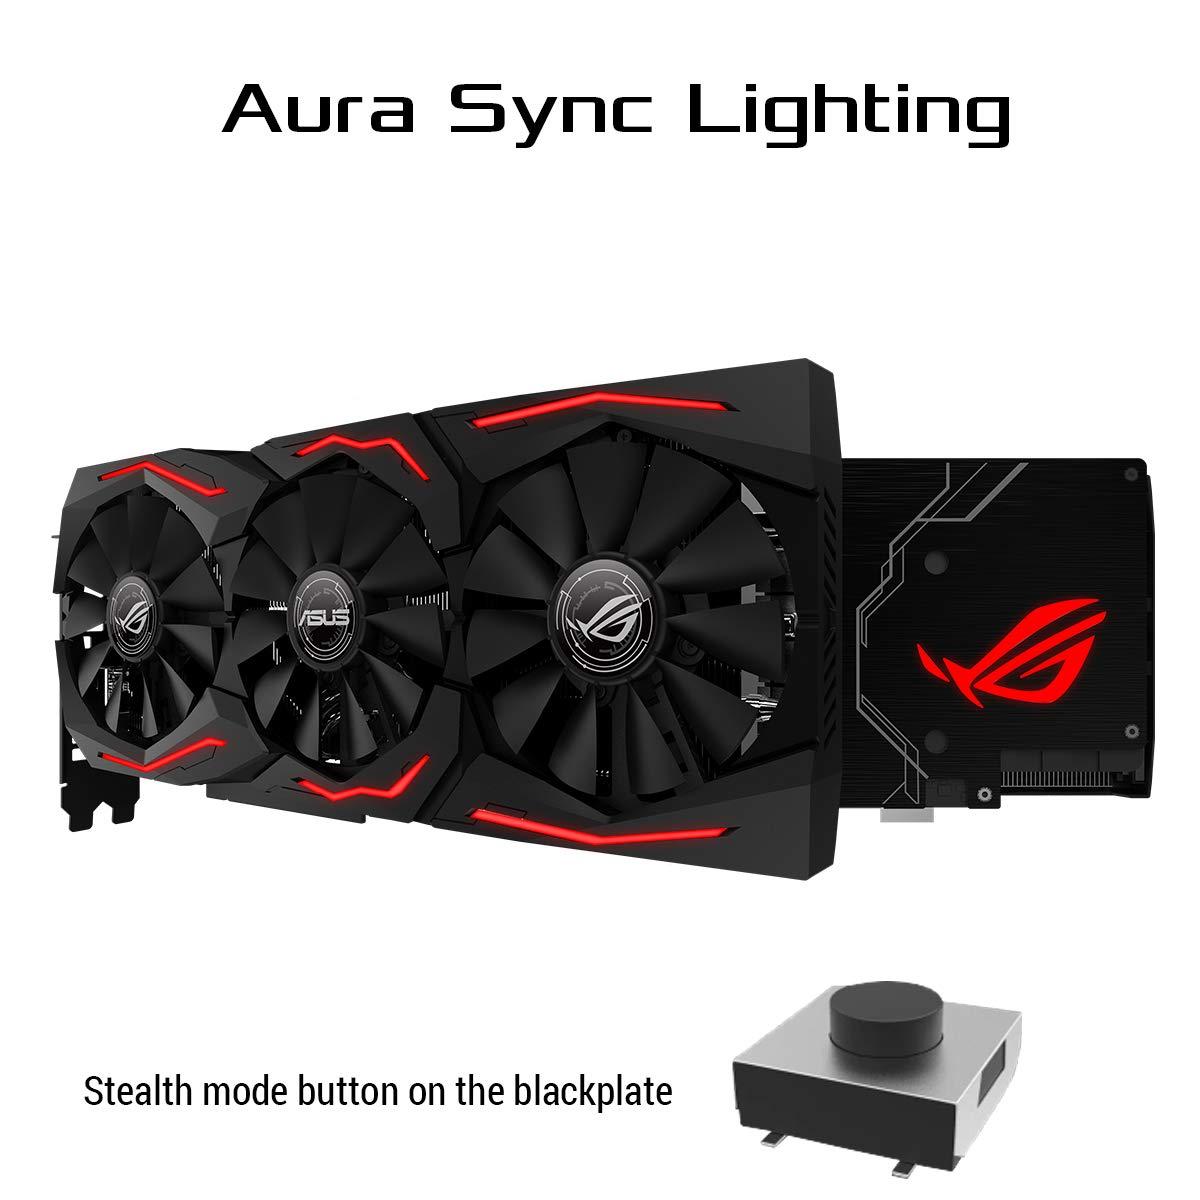 ASUS ROG Strix GeForce RTX 2060 Overclocked 6G GDDR6 HDMI DP 1.4 Gaming Graphics Card (ROG-STRIX-RTX-2060-O6G) by ASUS (Image #8)